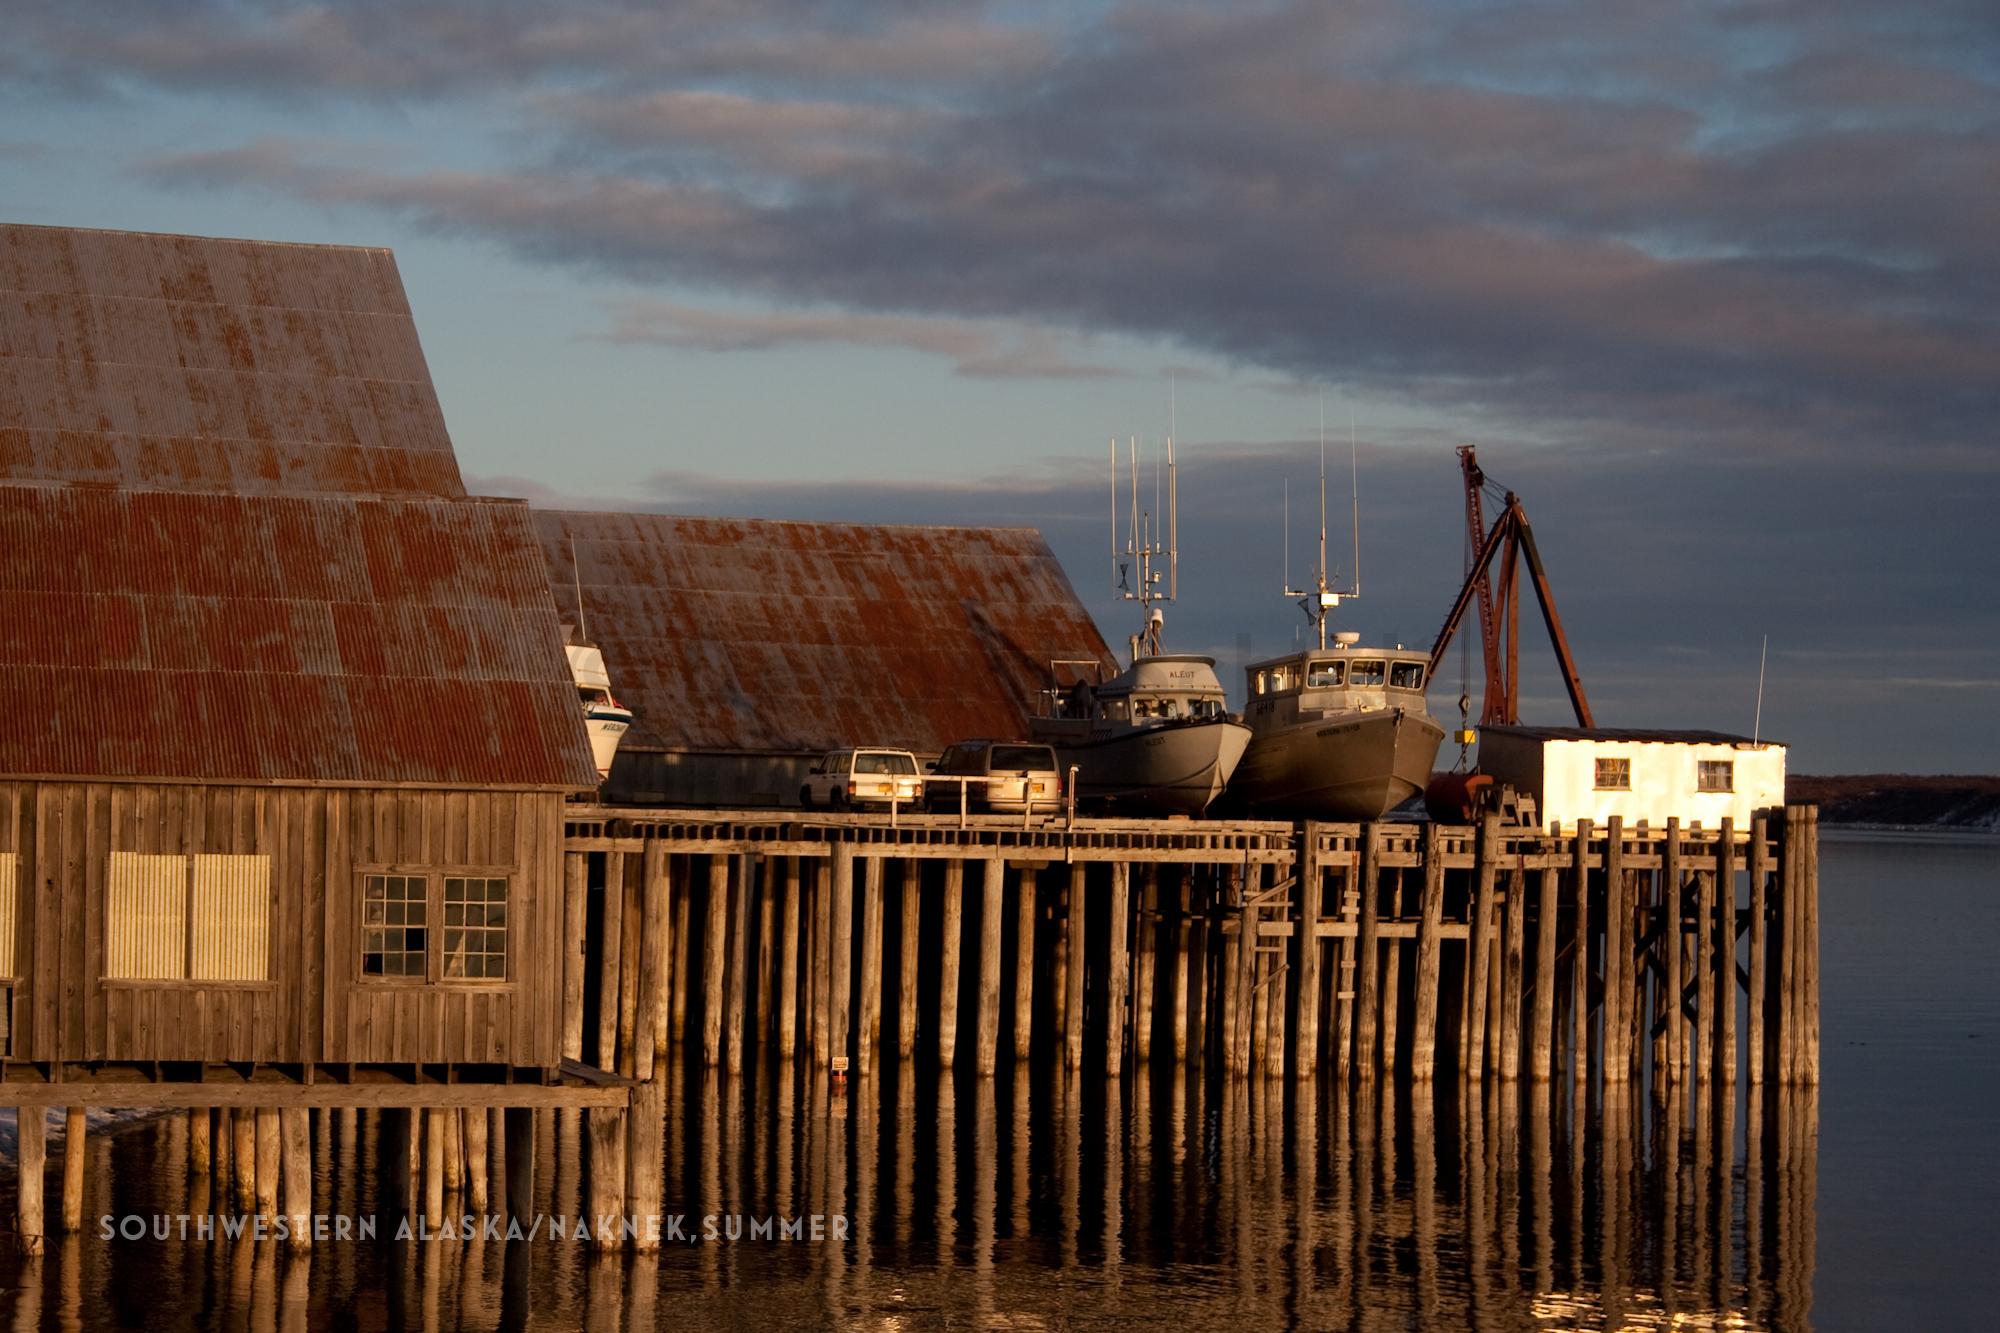 CT2 Southwestern Alaska-Naknek_summer.jpg